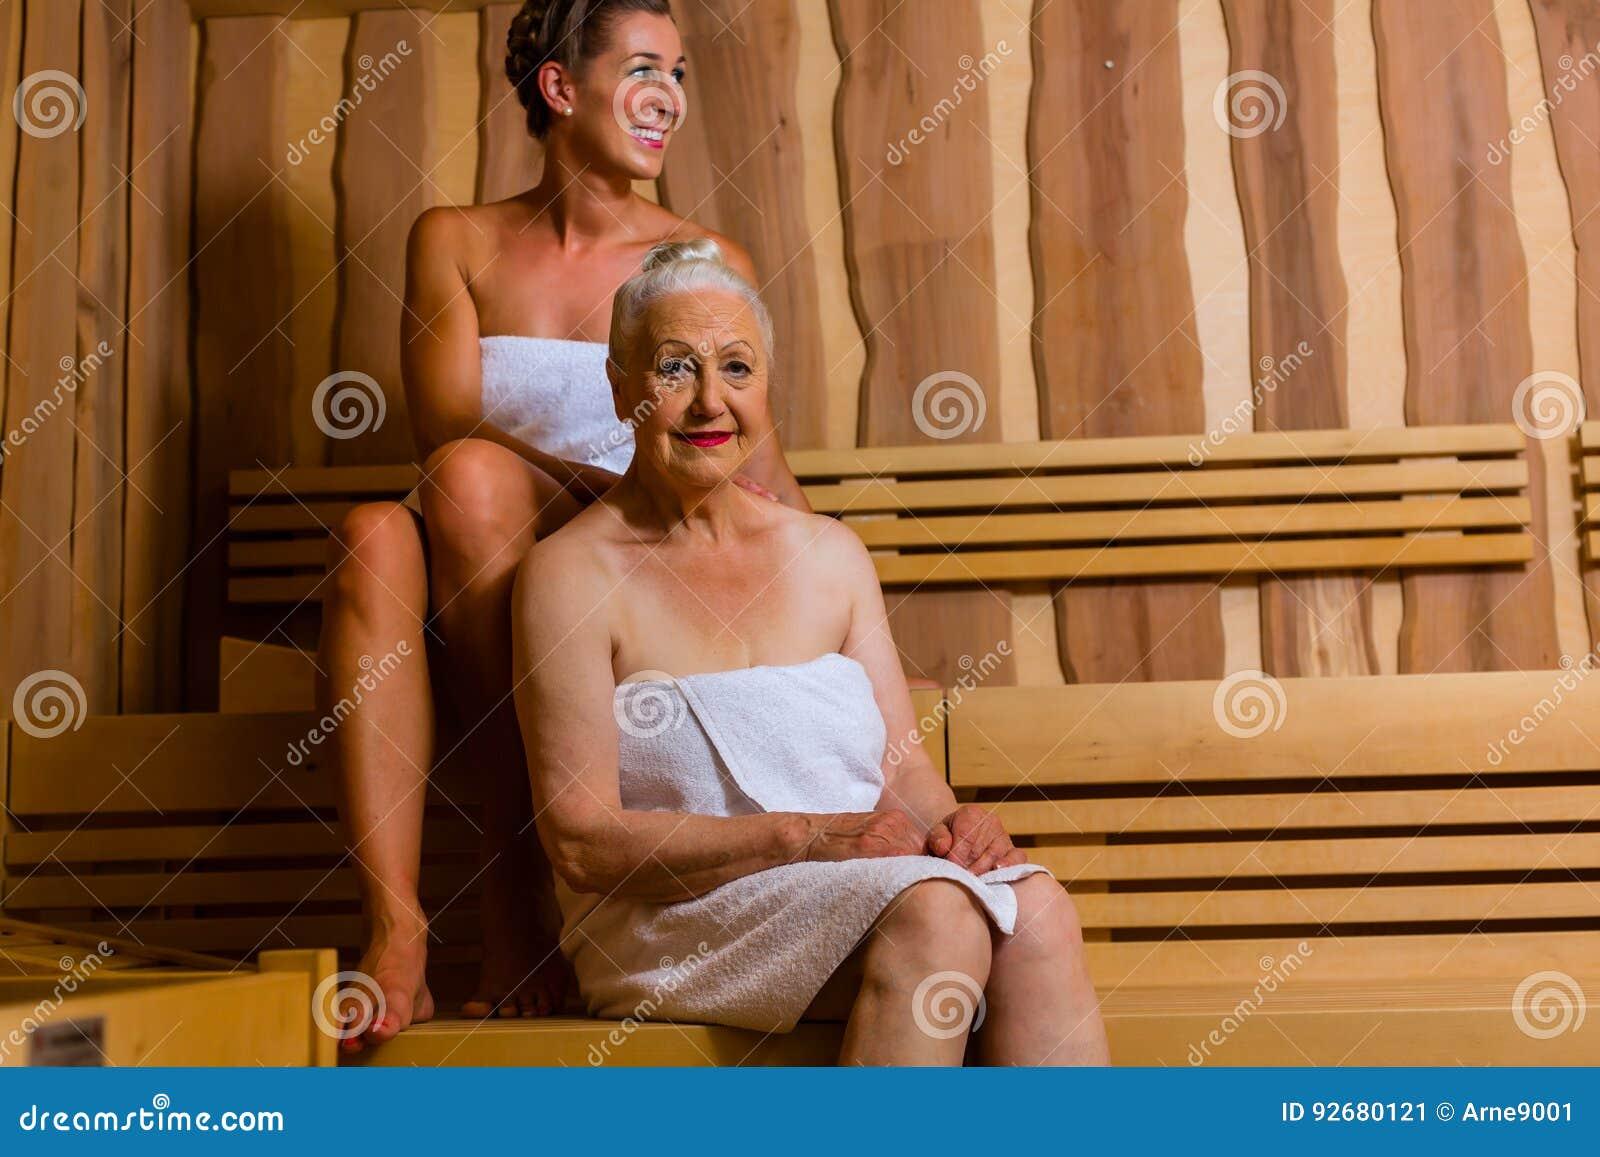 femme en chaleur